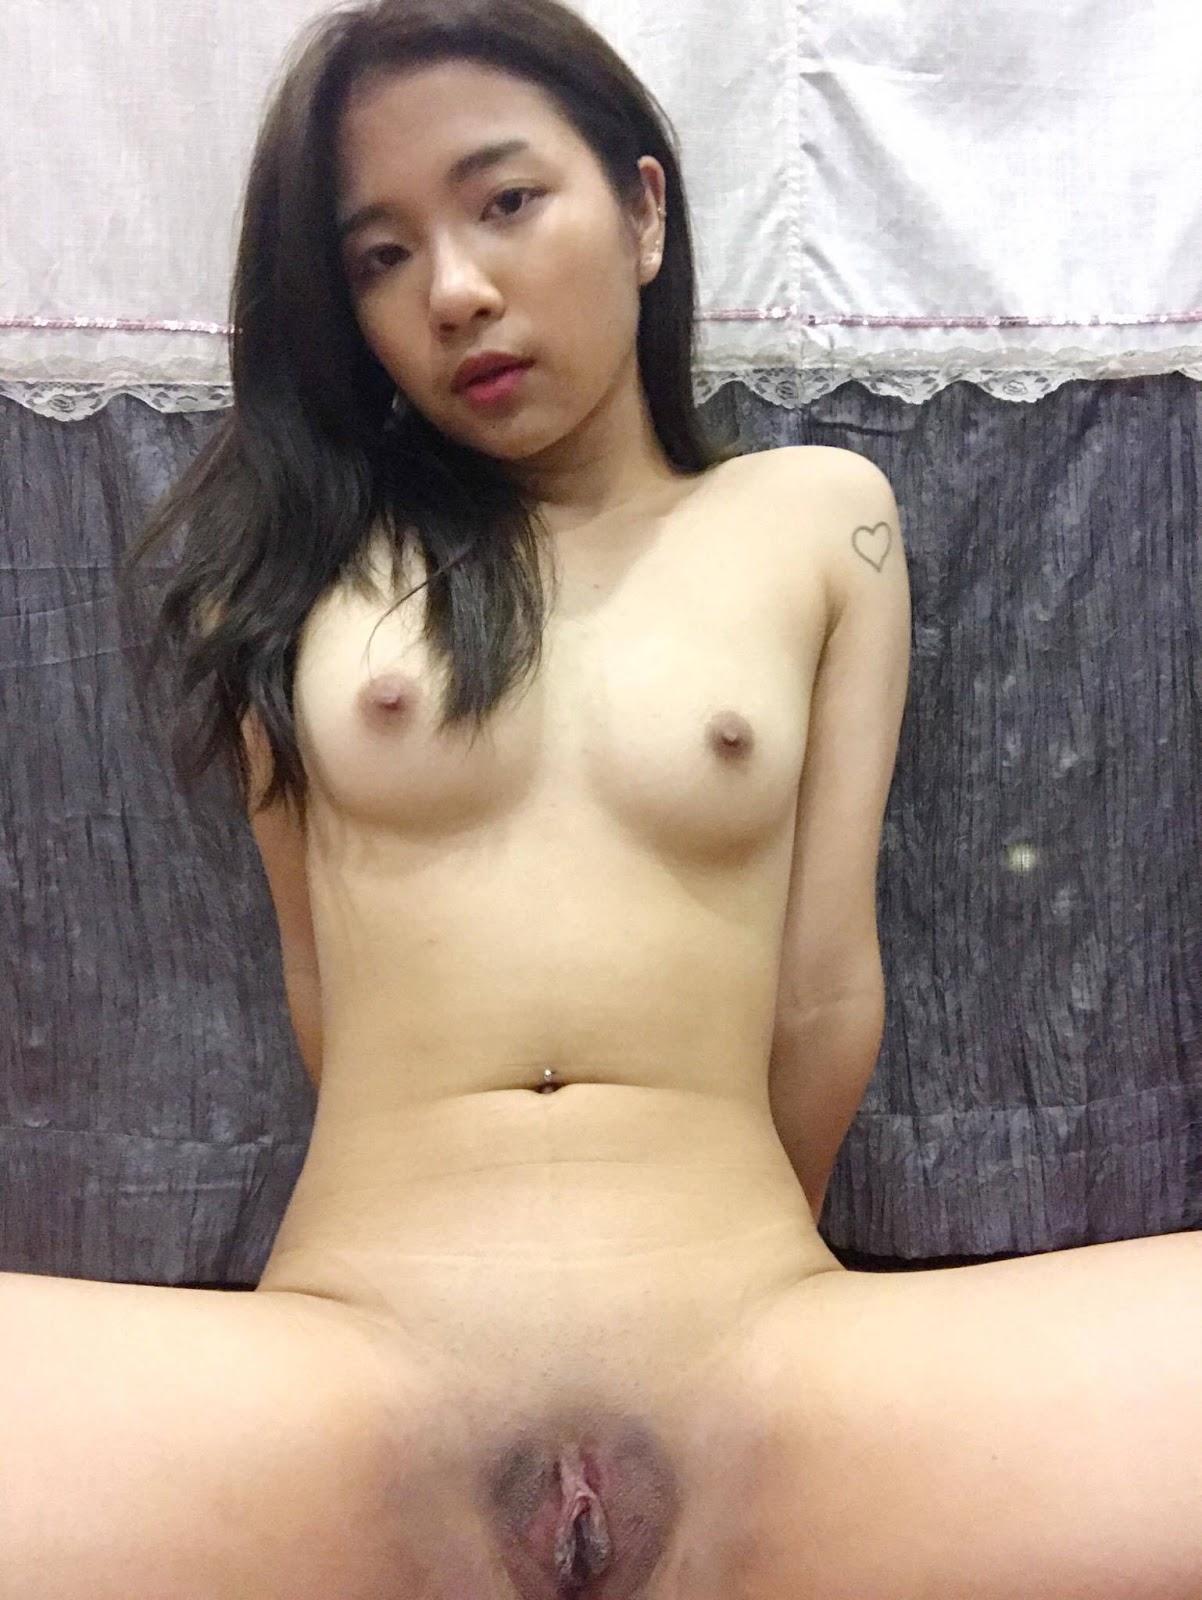 Asian Nudes Show